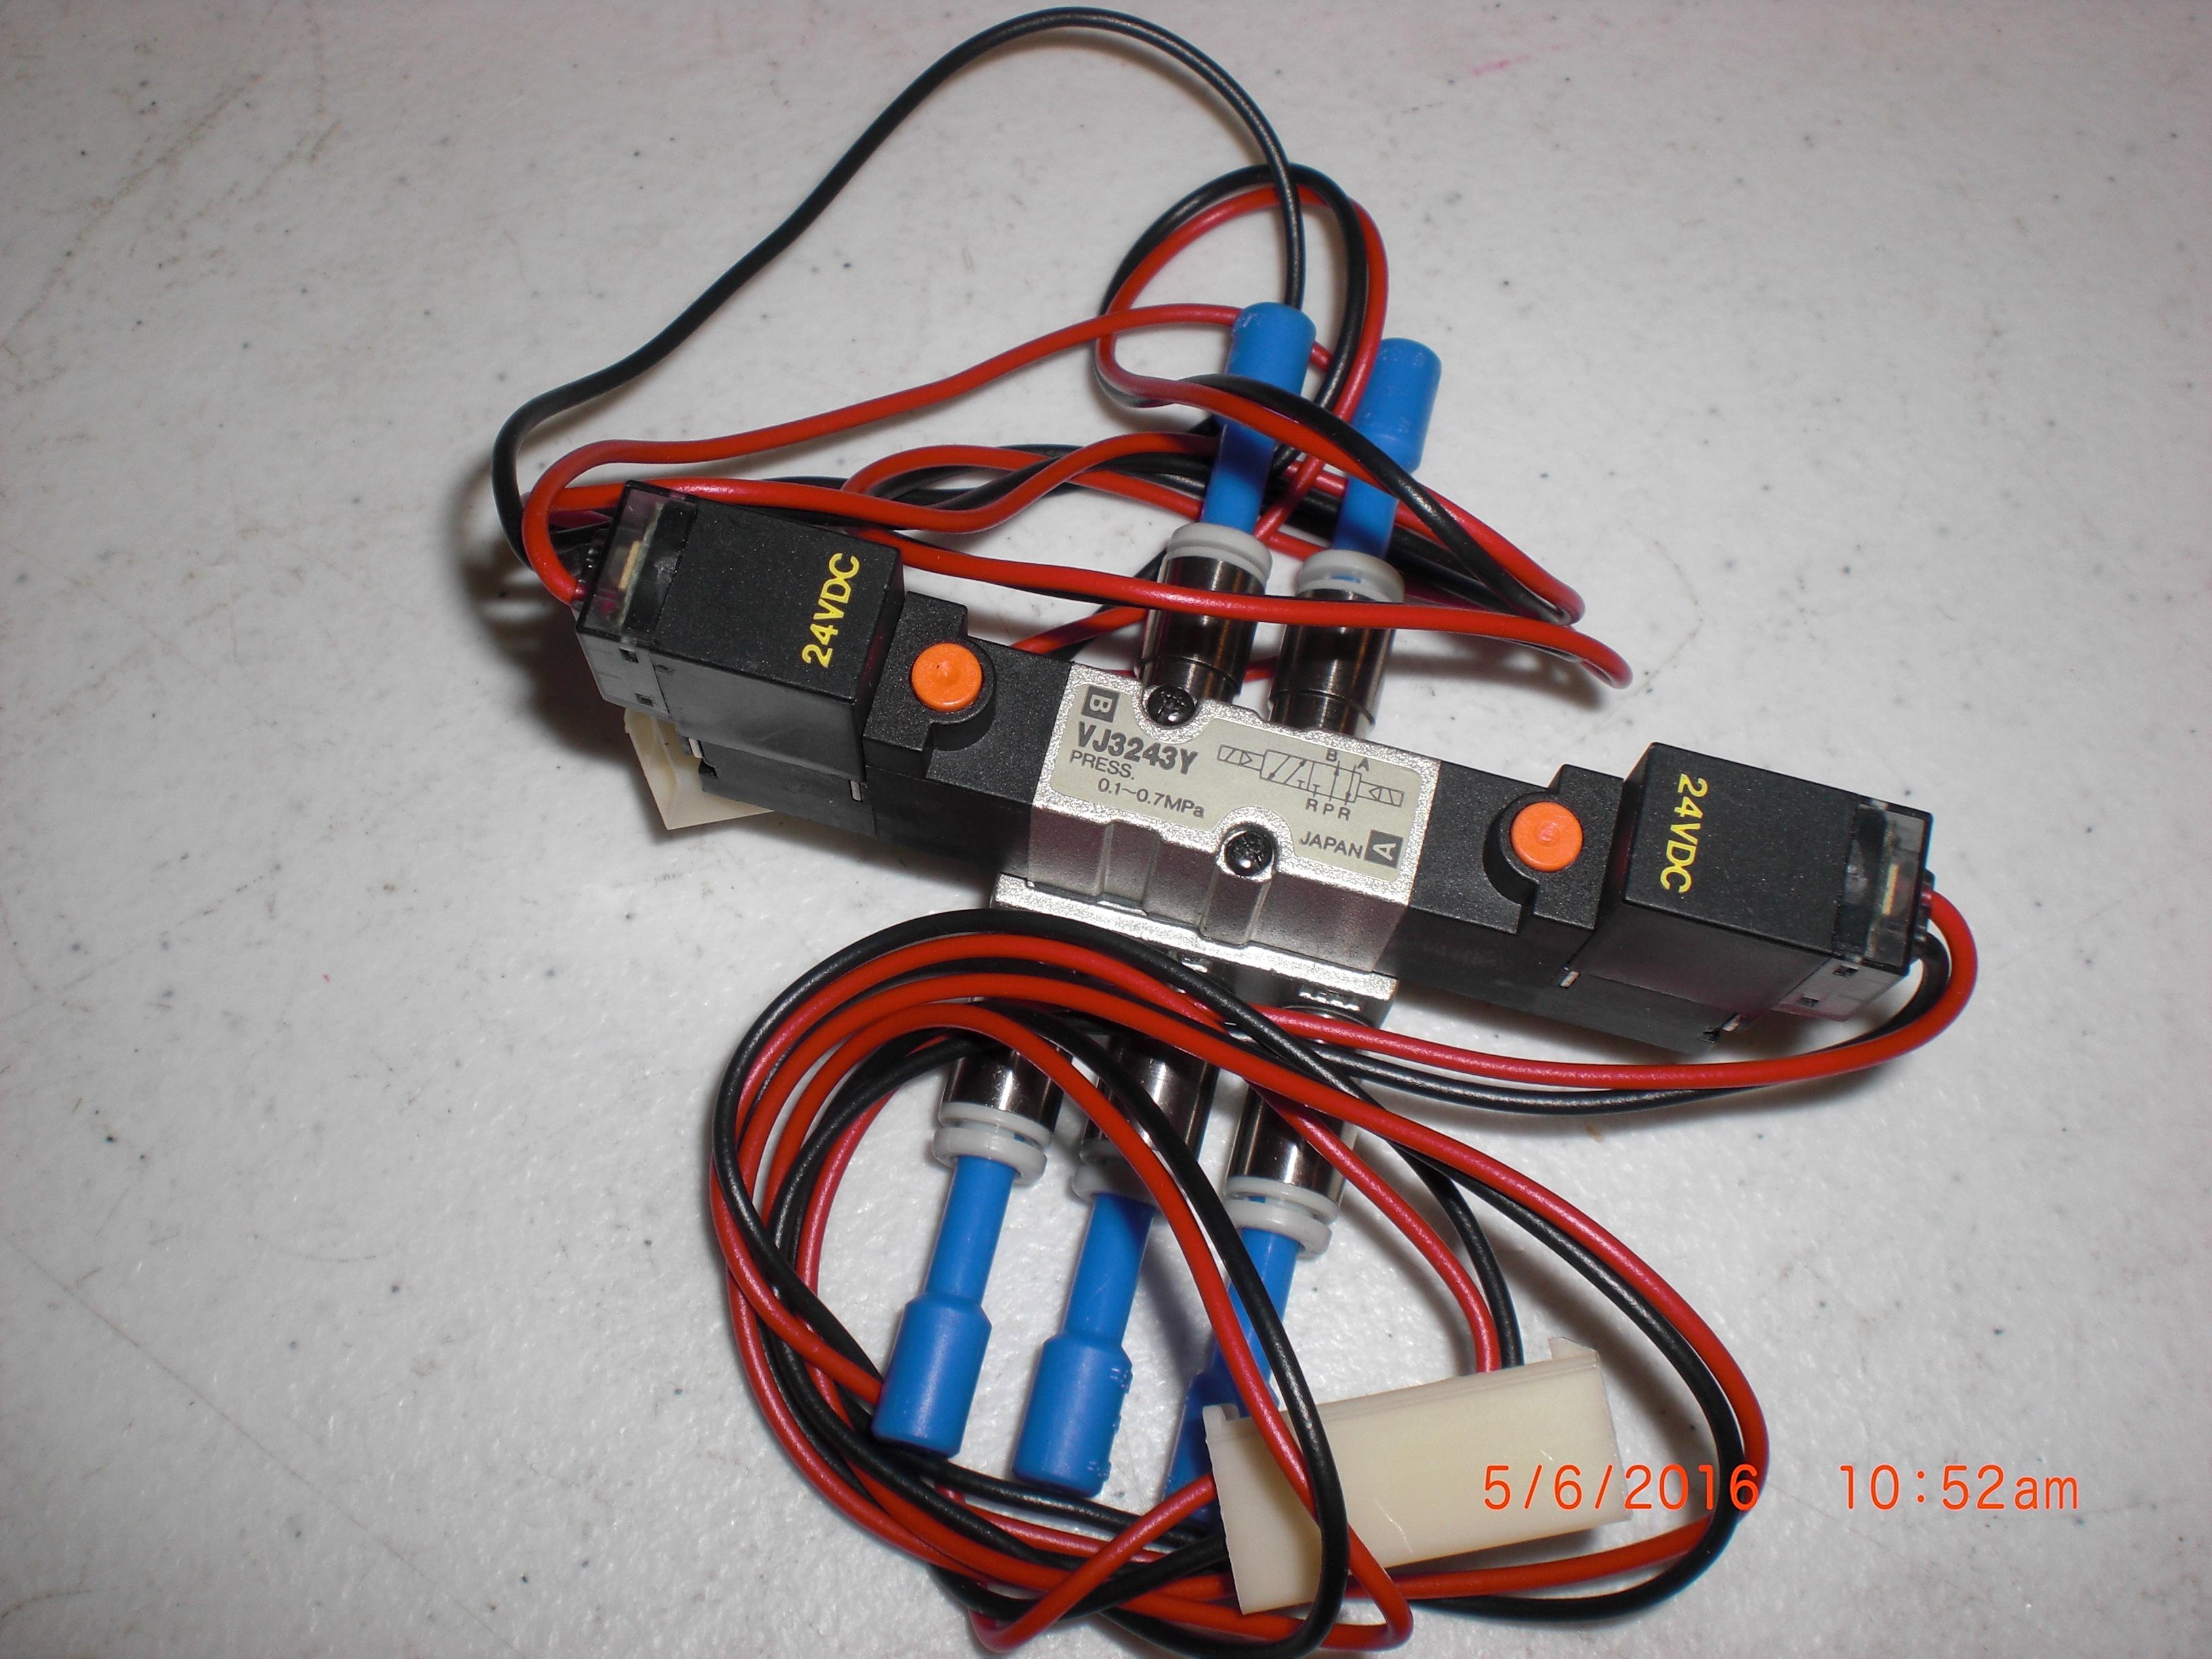 Valve SMC VJ3243Y solenoid manifold valve 24vdc